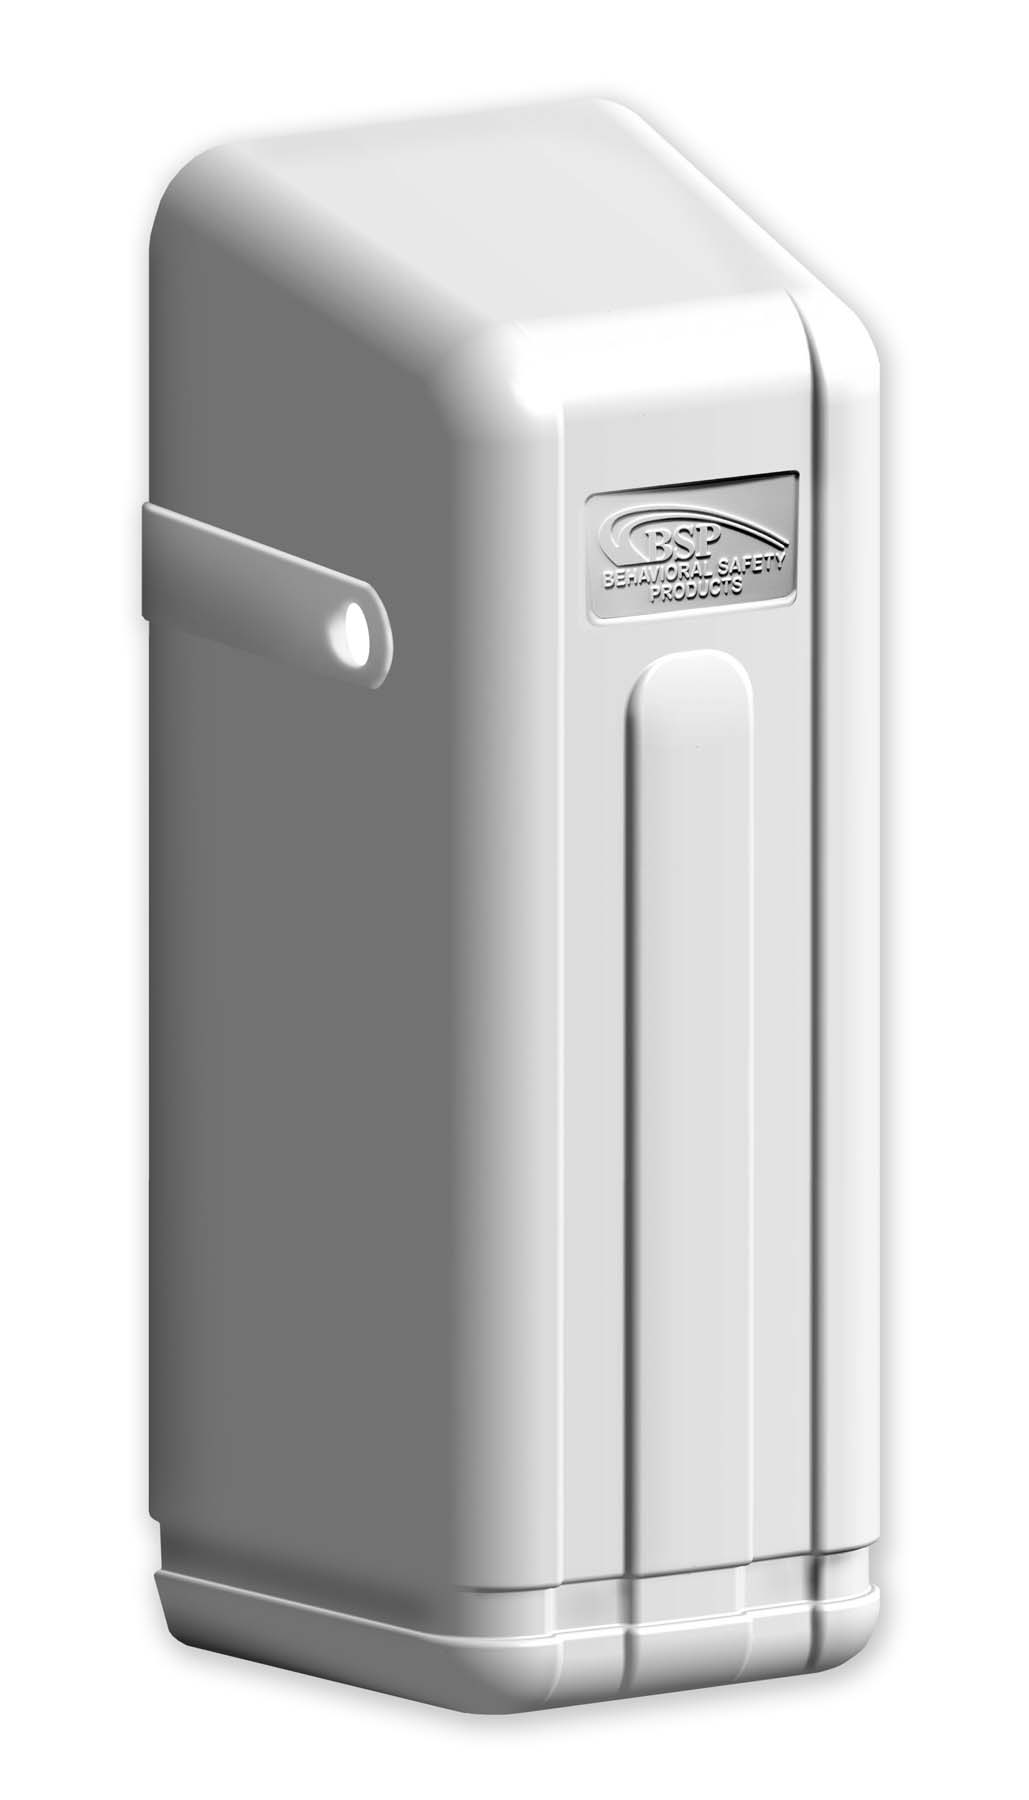 Ligature Resistant Flush Valve Cover